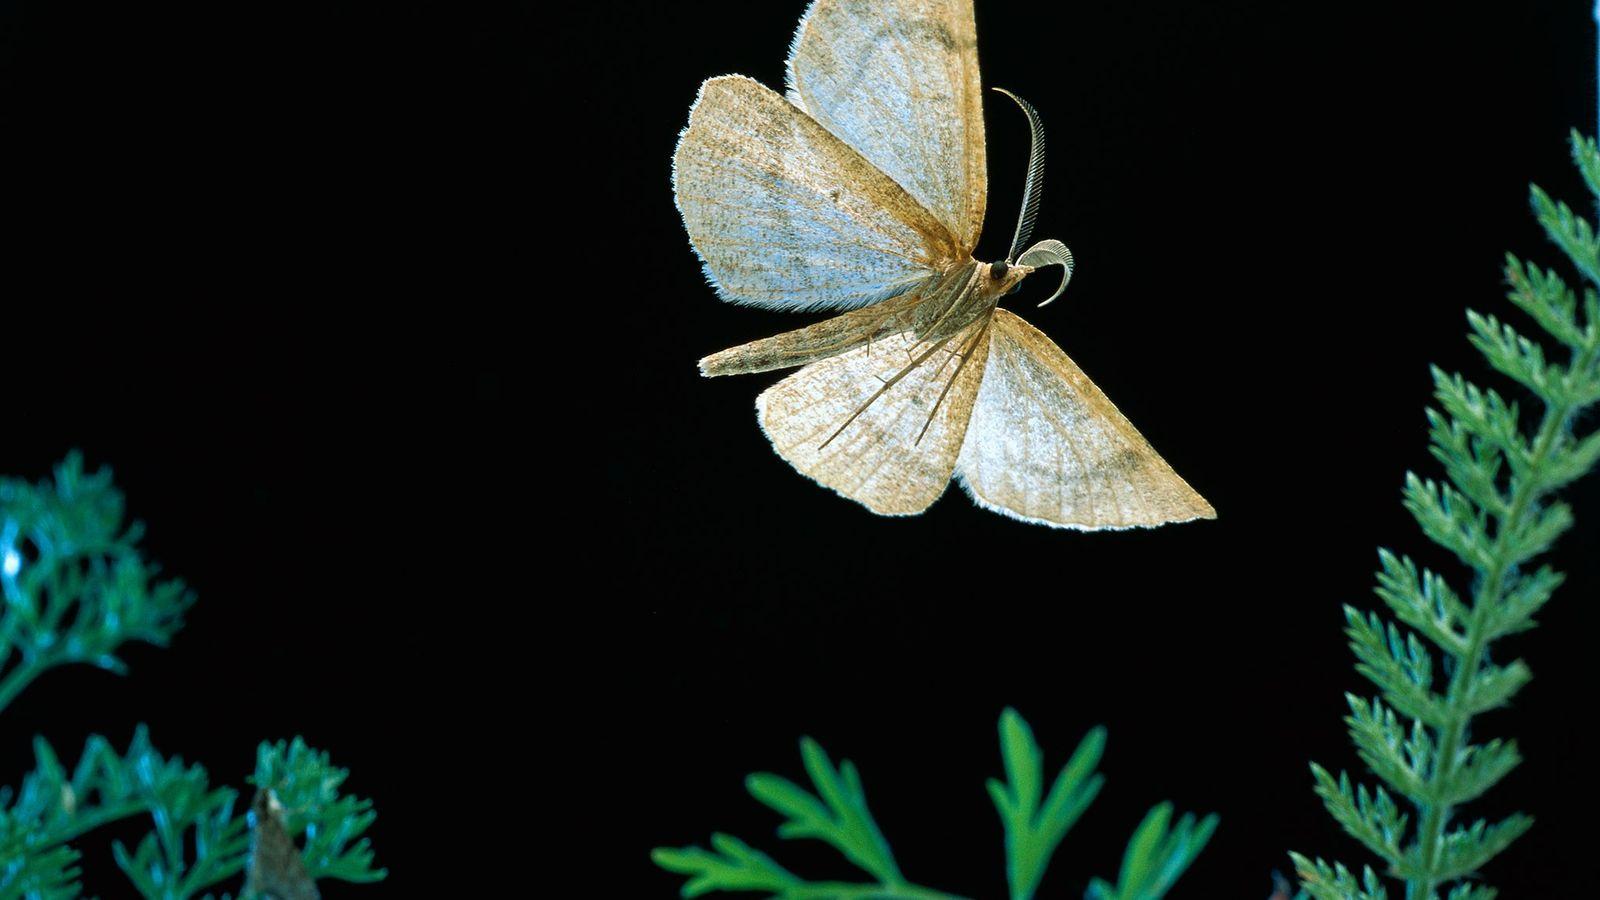 A traça da espécie Tricholupsia ni, vista aqui na Floresta Nacional de Mount Hood no Oregon, ...